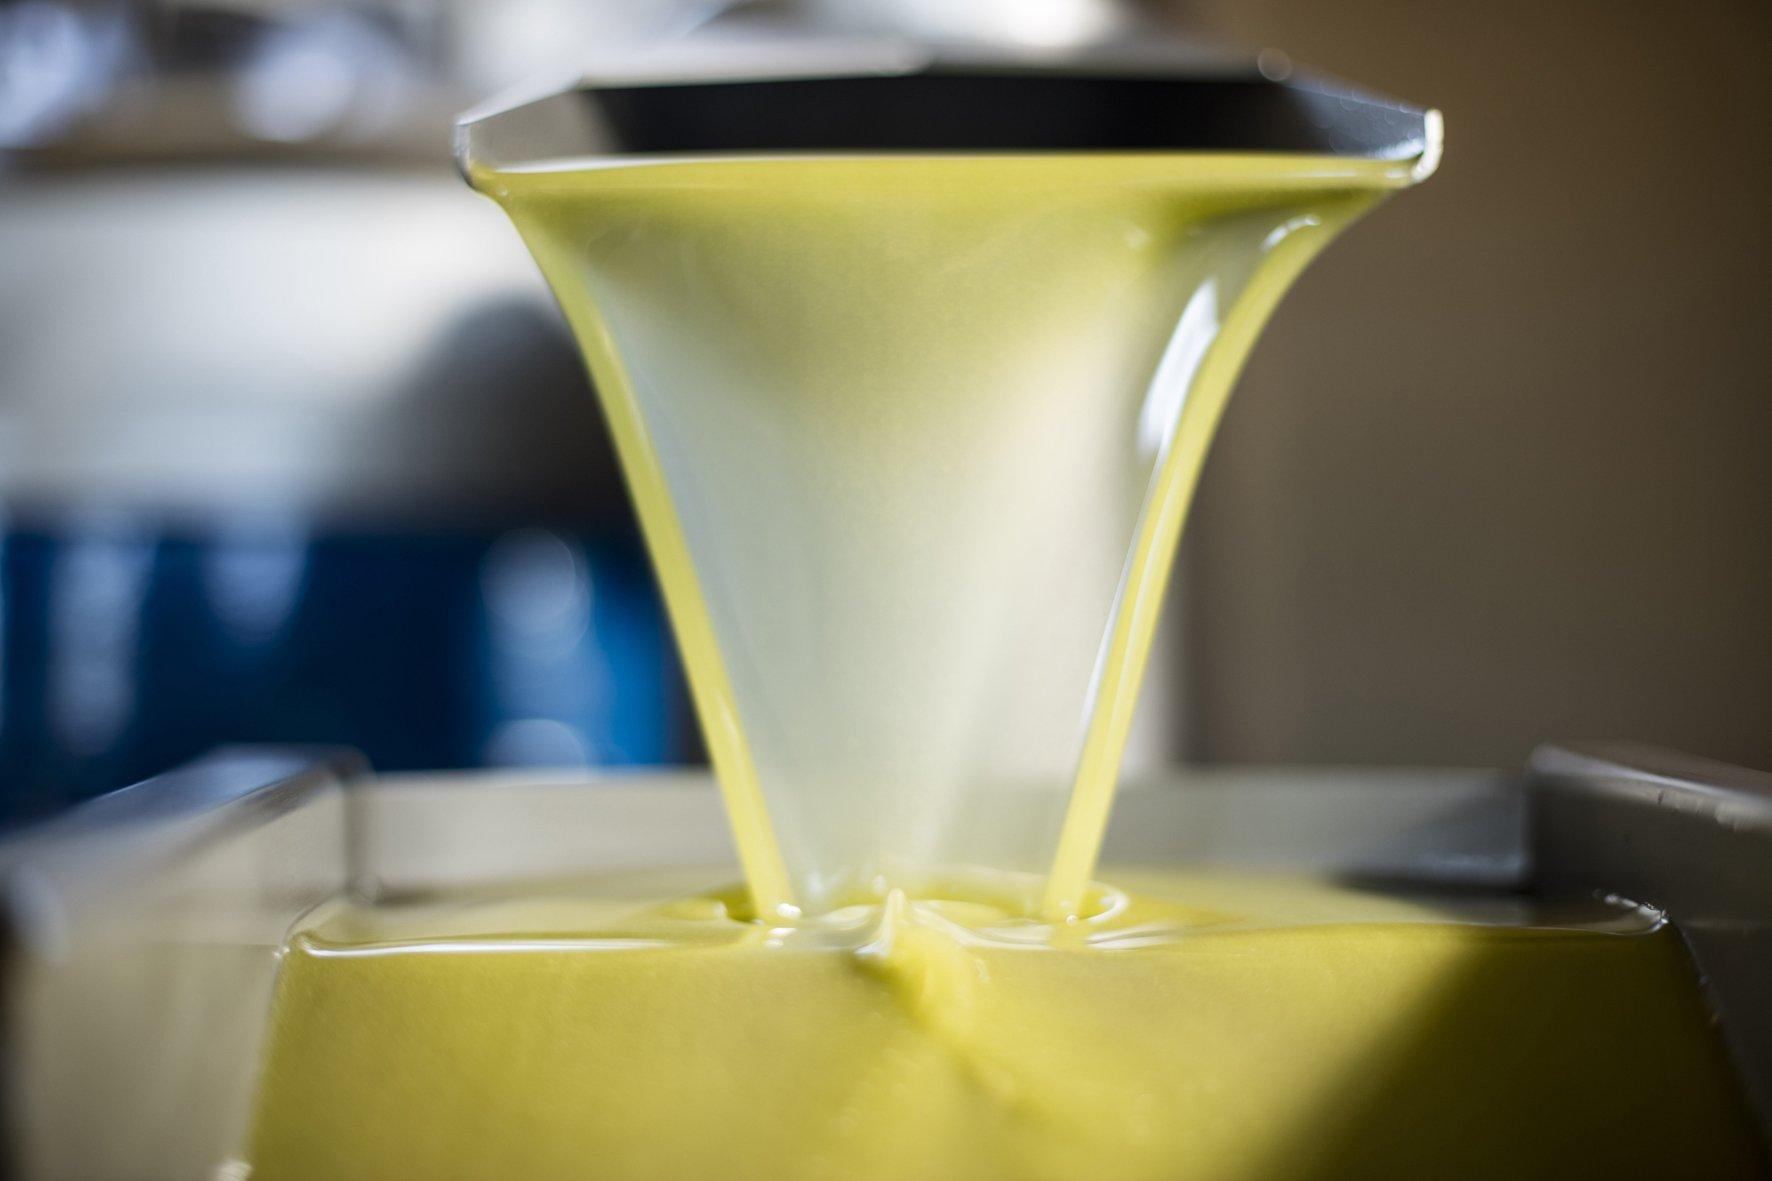 TOKARA Olive Oil press sonia cabano blog eatdrinkcapetown